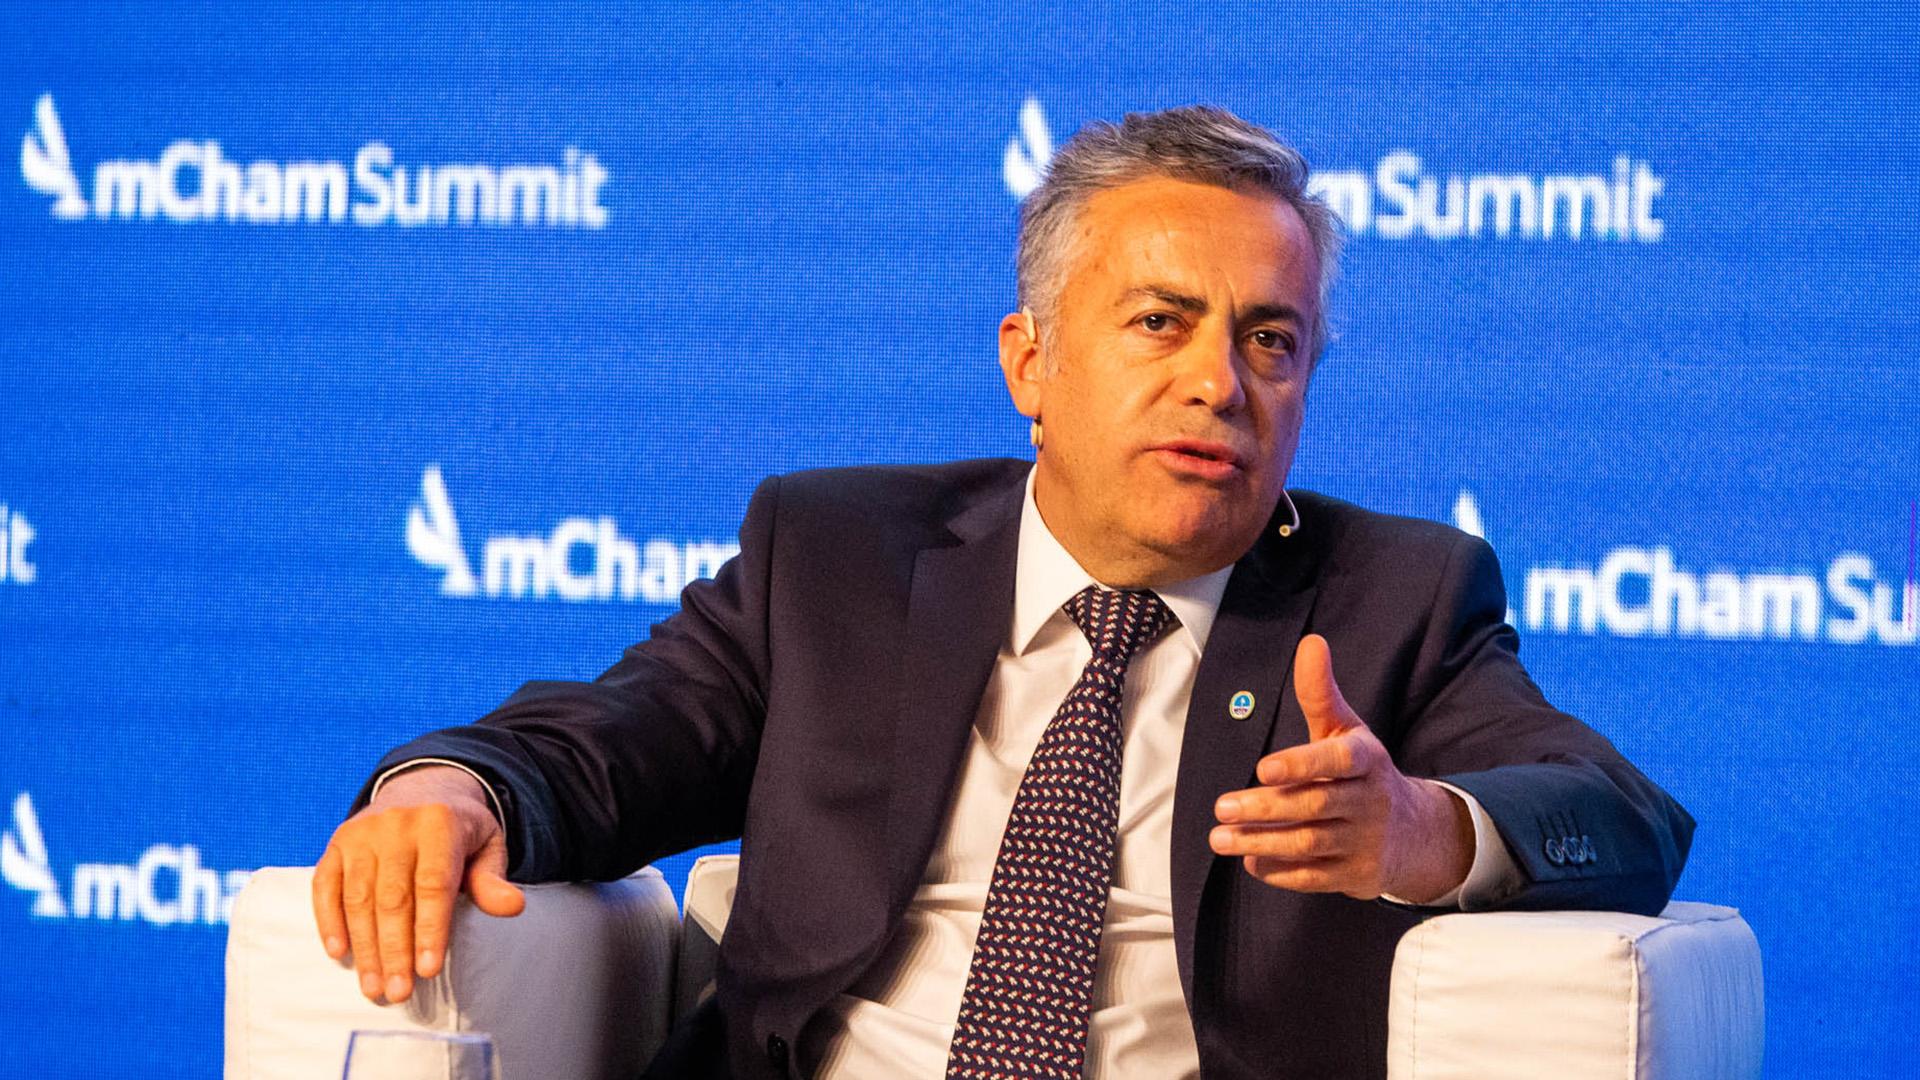 El jefe de la UCR Alfredo Cornejo